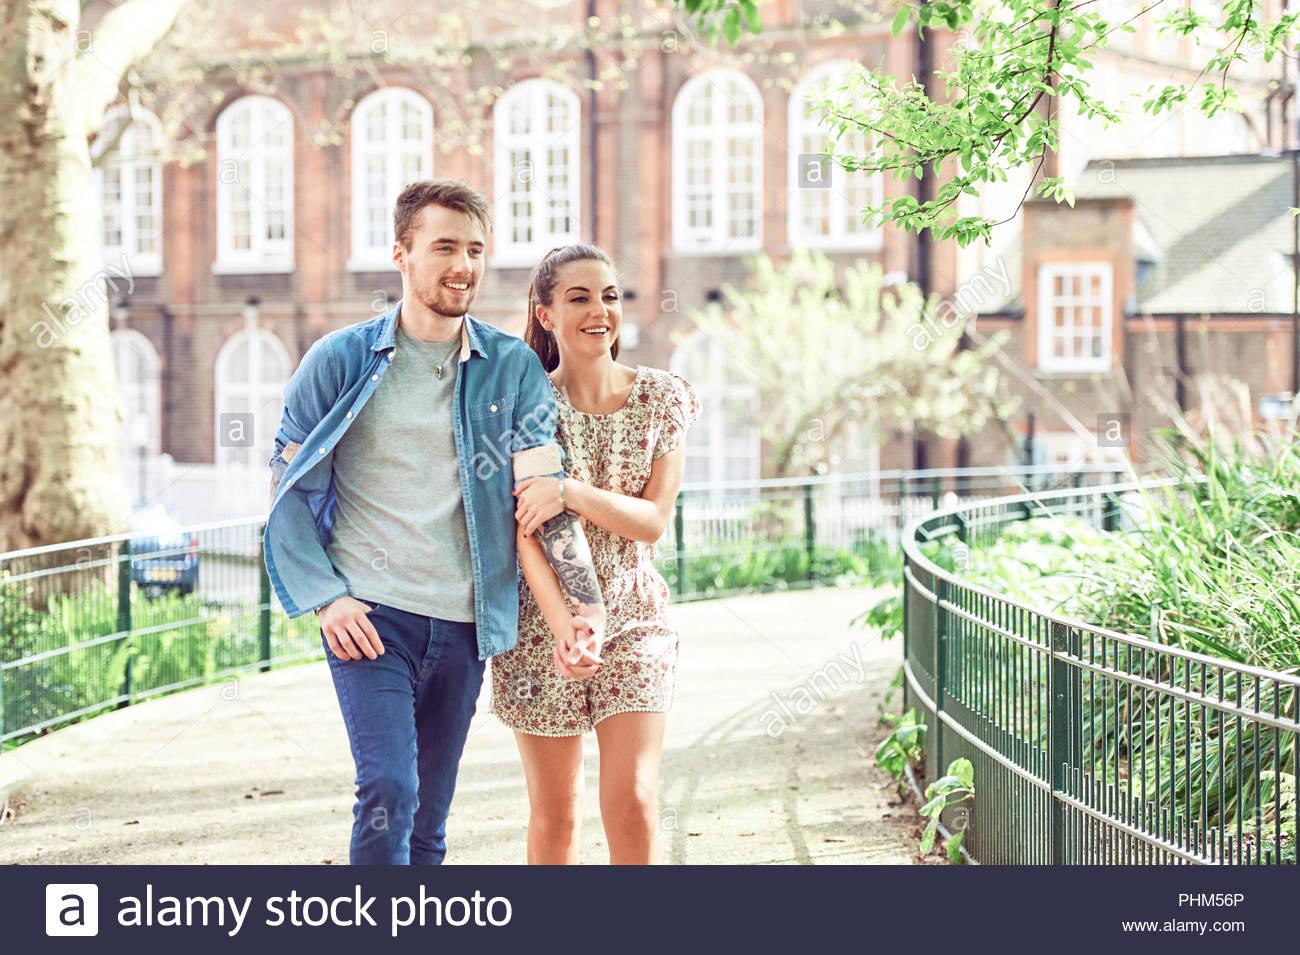 Teenage couple walking in park - Stock Image